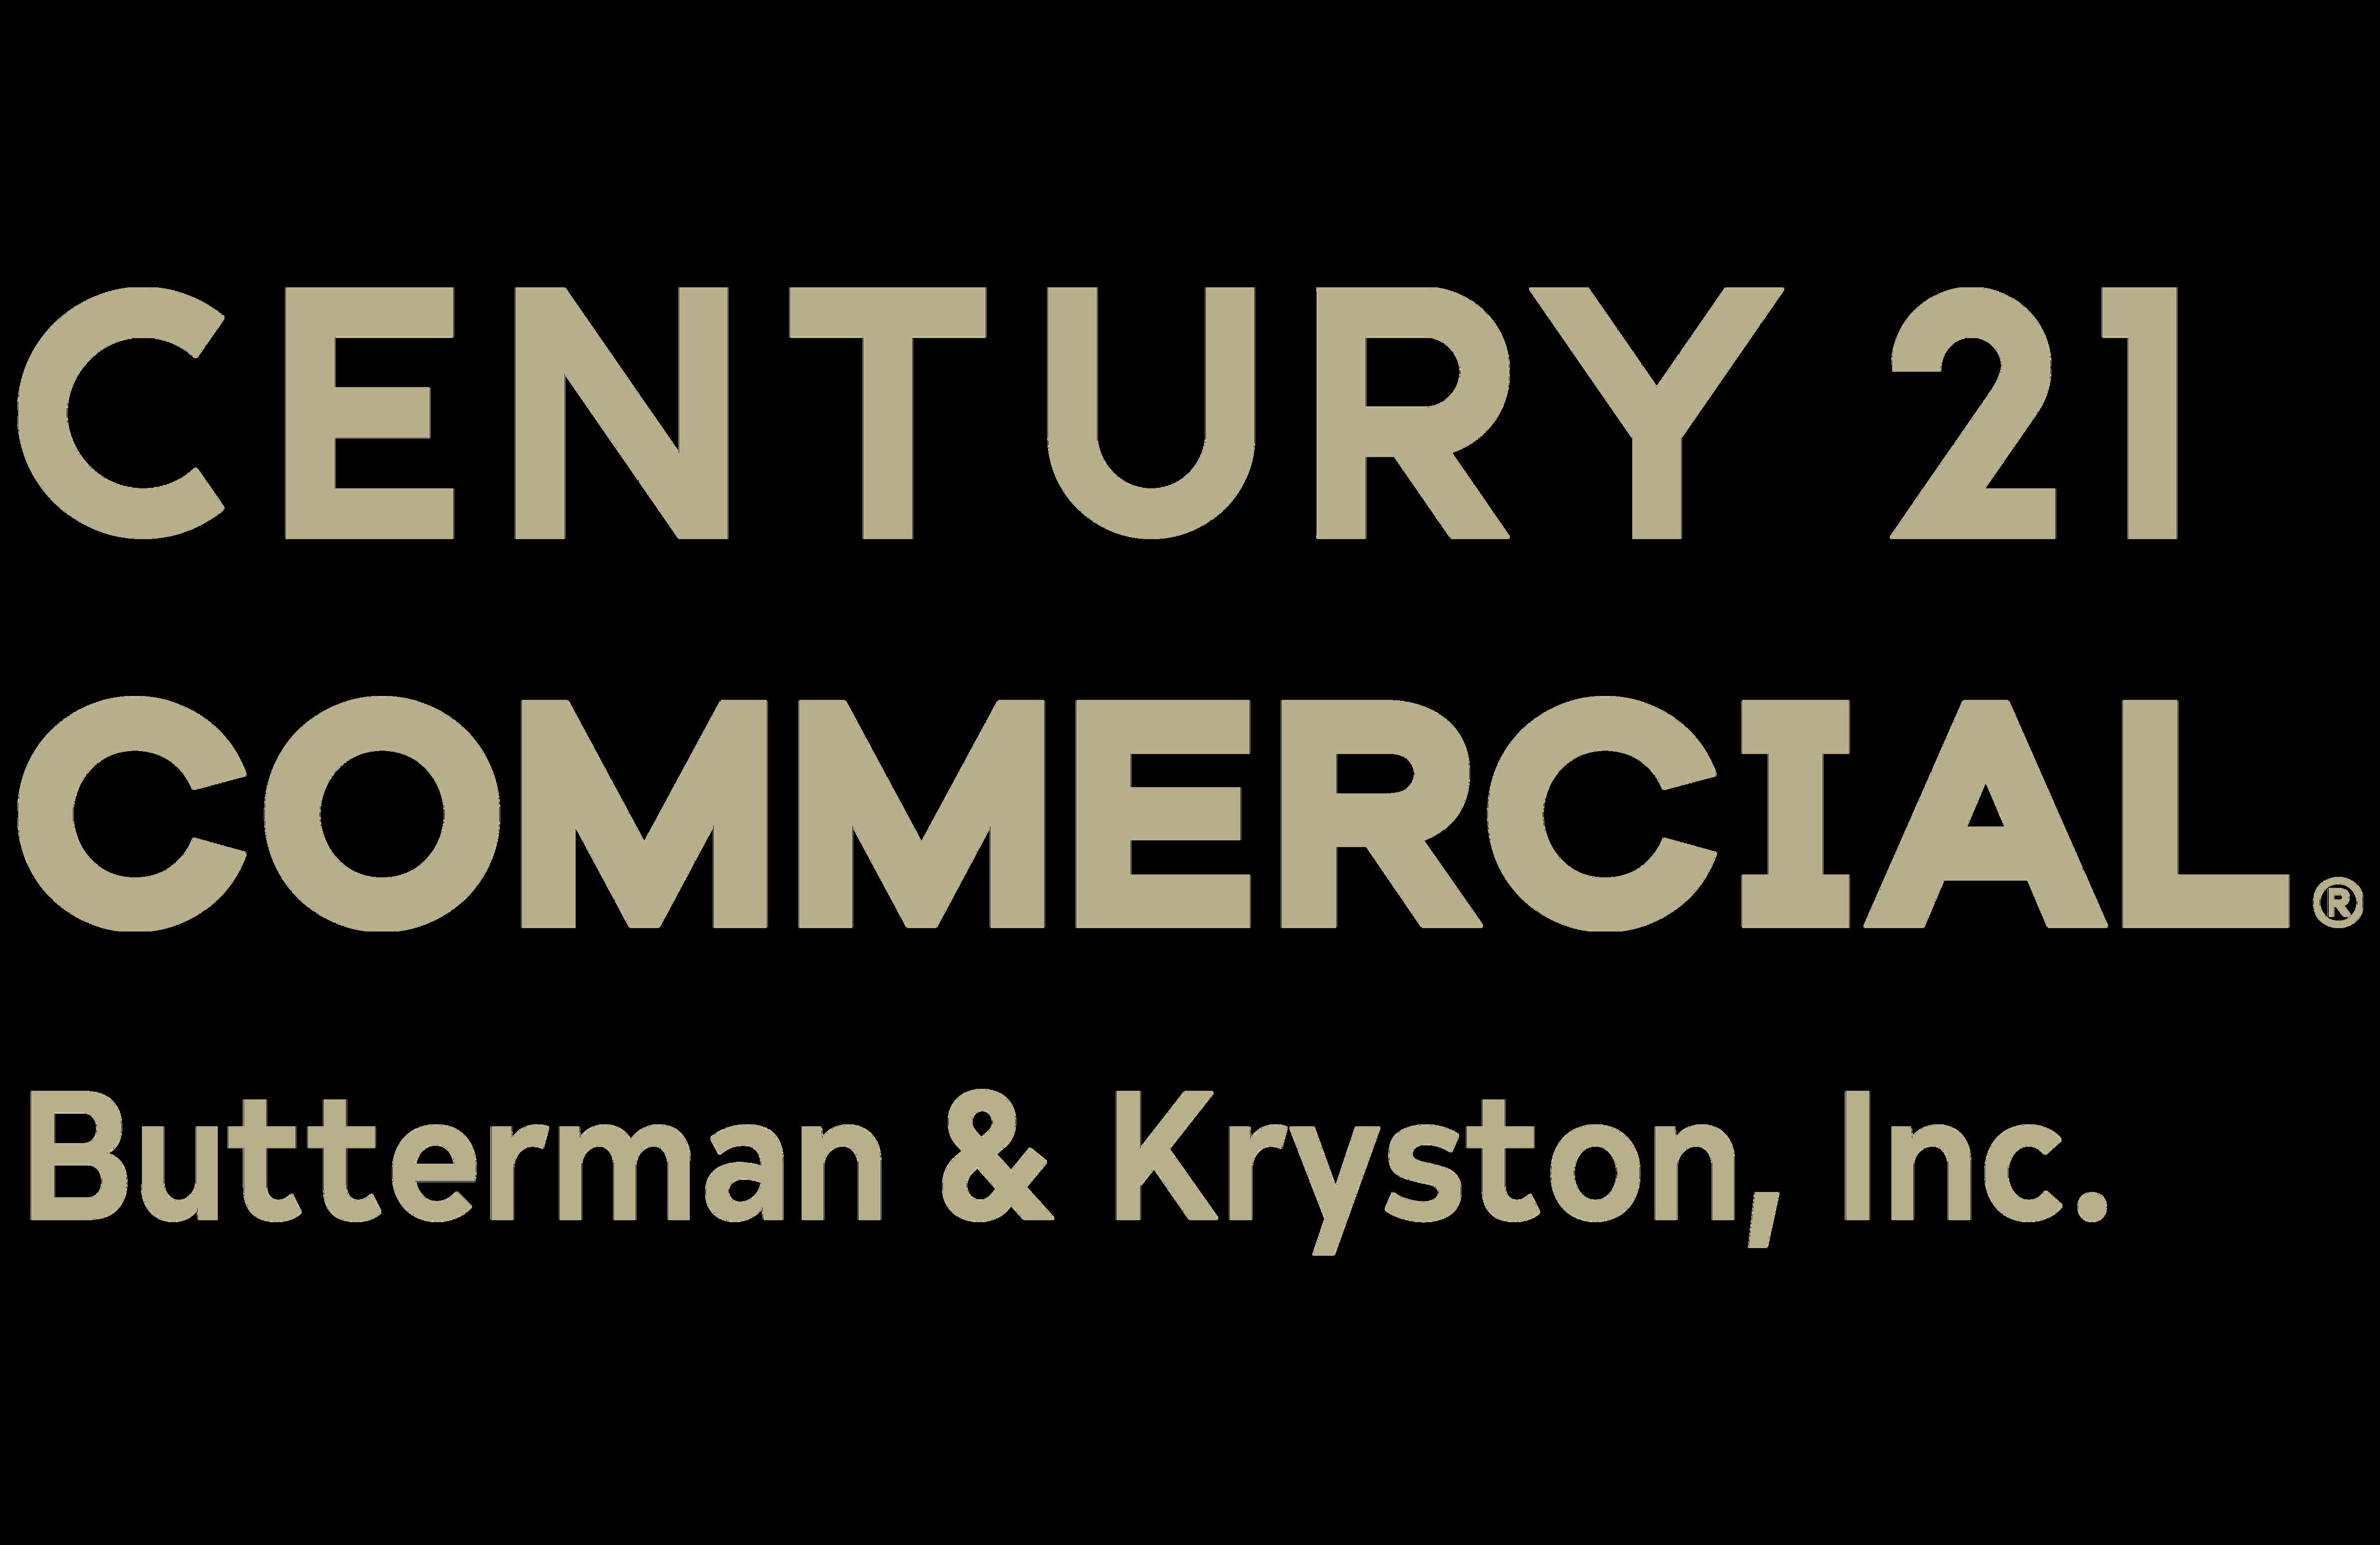 Doreen Peirce of CENTURY 21 Butterman & Kryston, Inc. logo